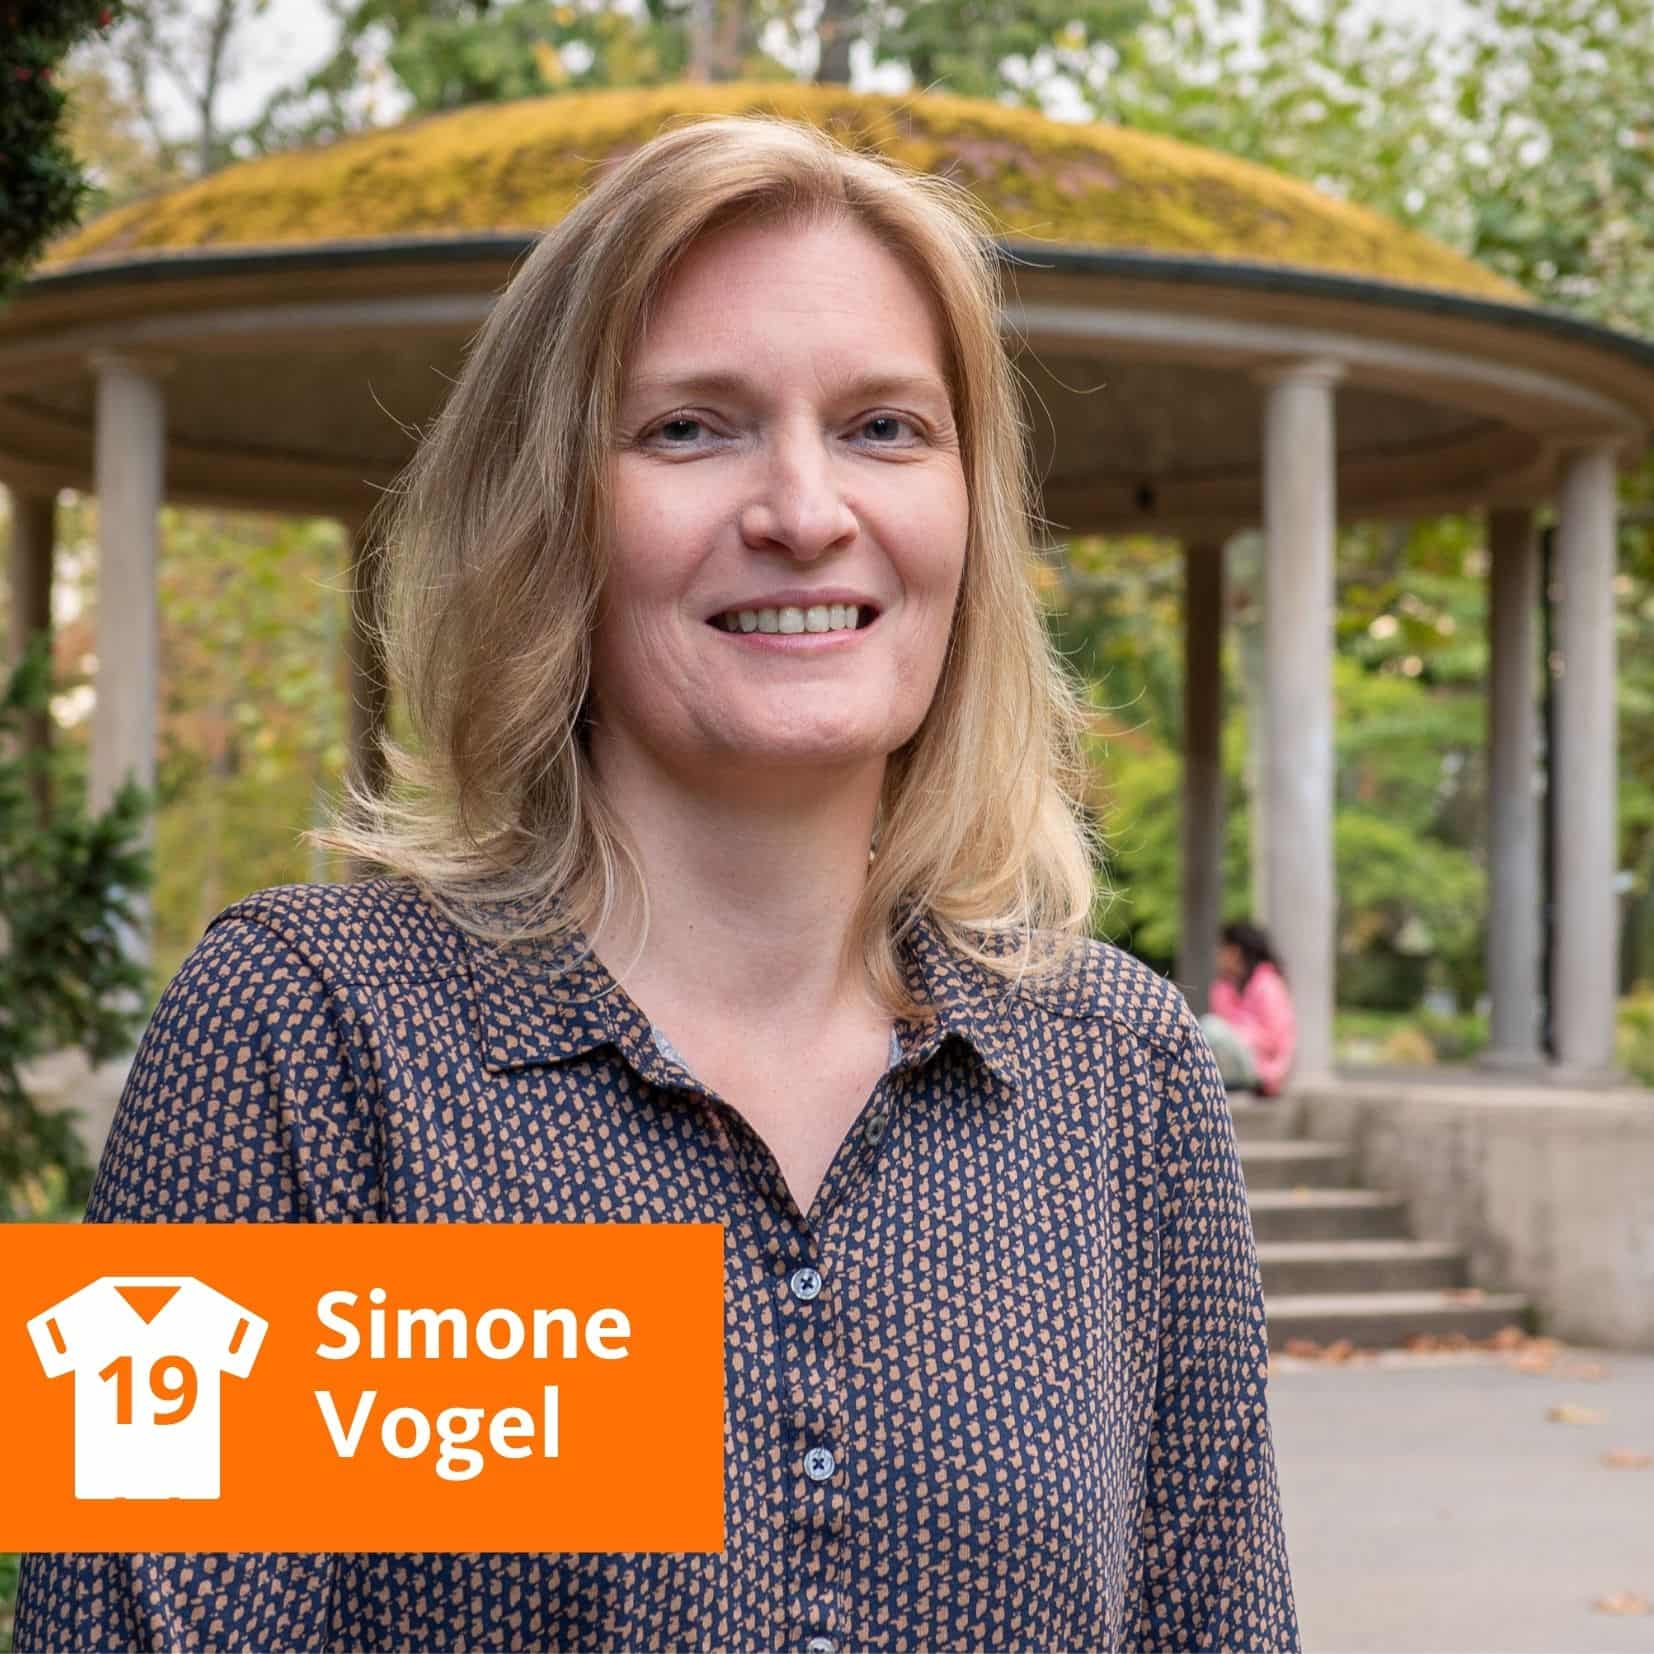 Simone Vogel